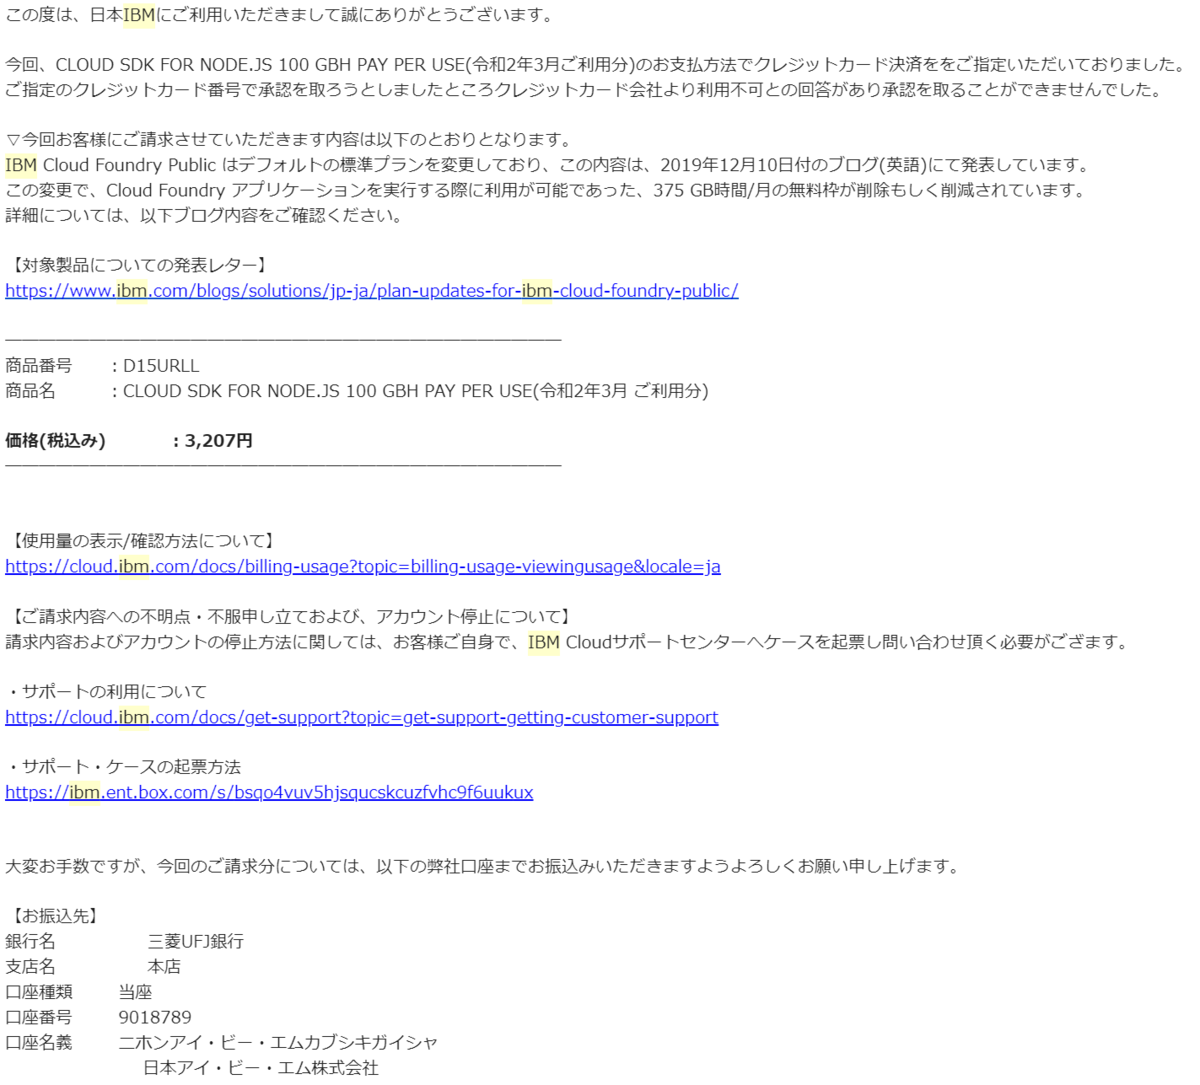 f:id:jaco-m:20200517190016p:plain